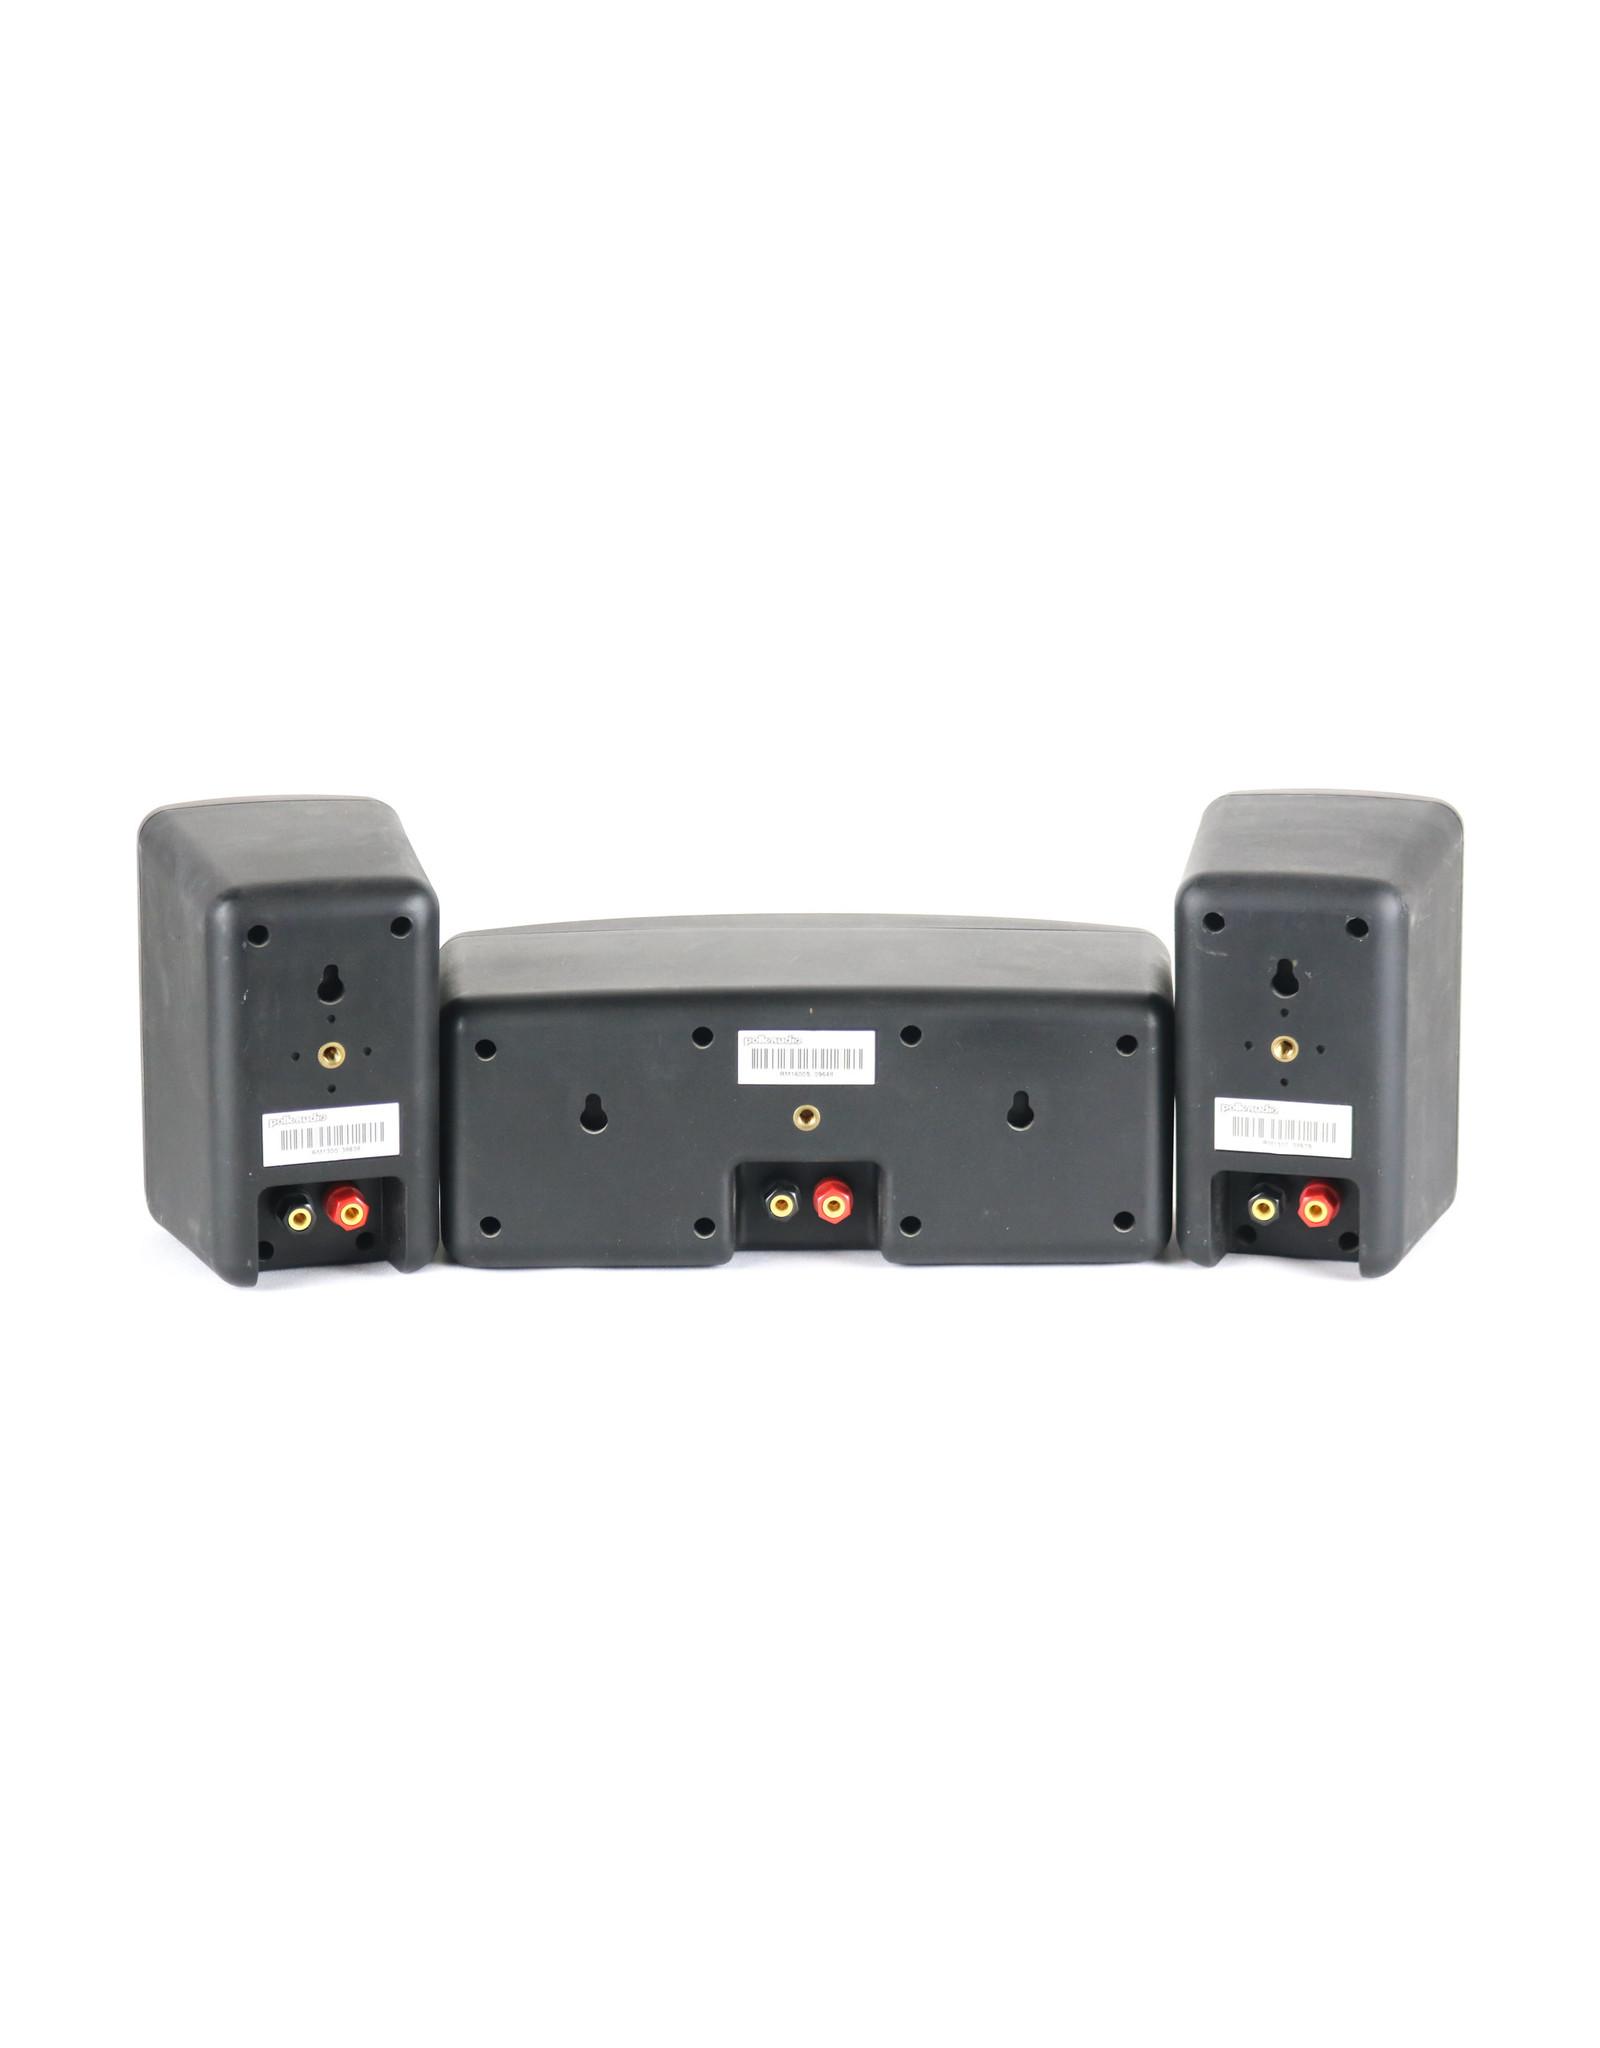 Polk Polk RM-1300 / RM-1600S Satellite + Center Speakers USED